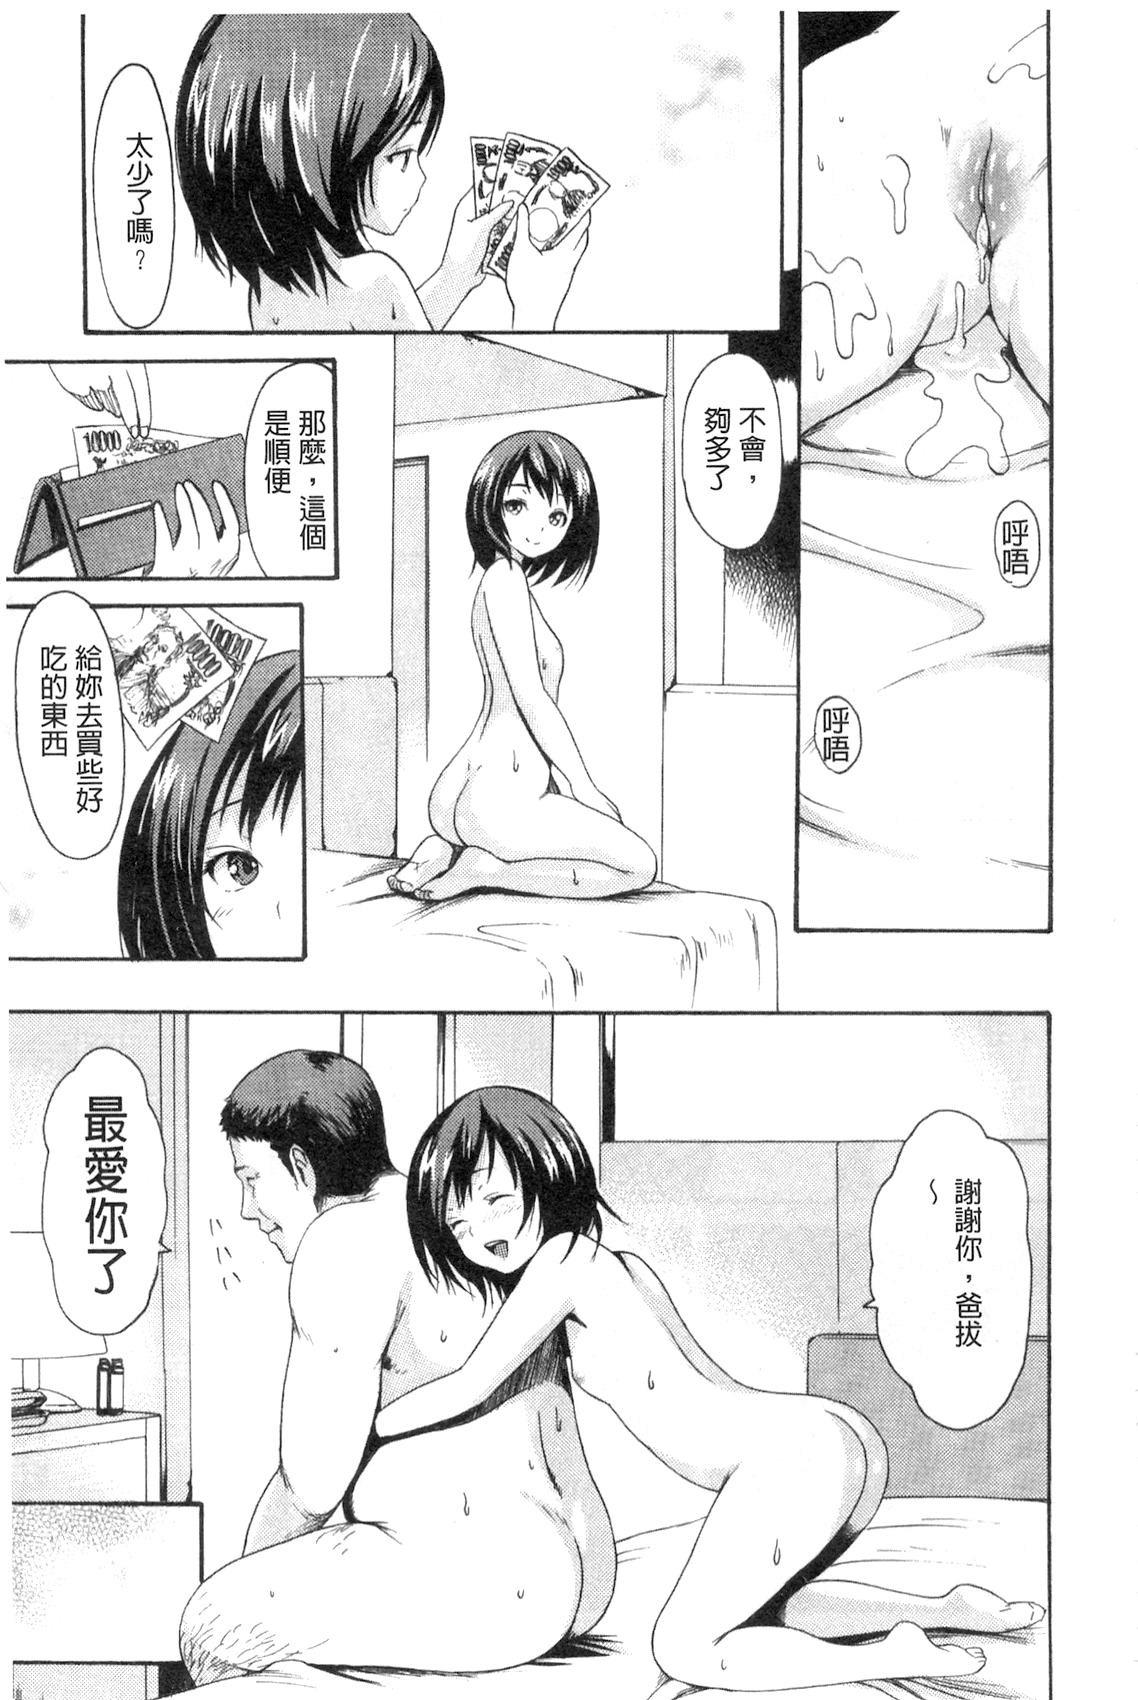 Yawahada Otome | 柔嫩肌膚的乙女 151